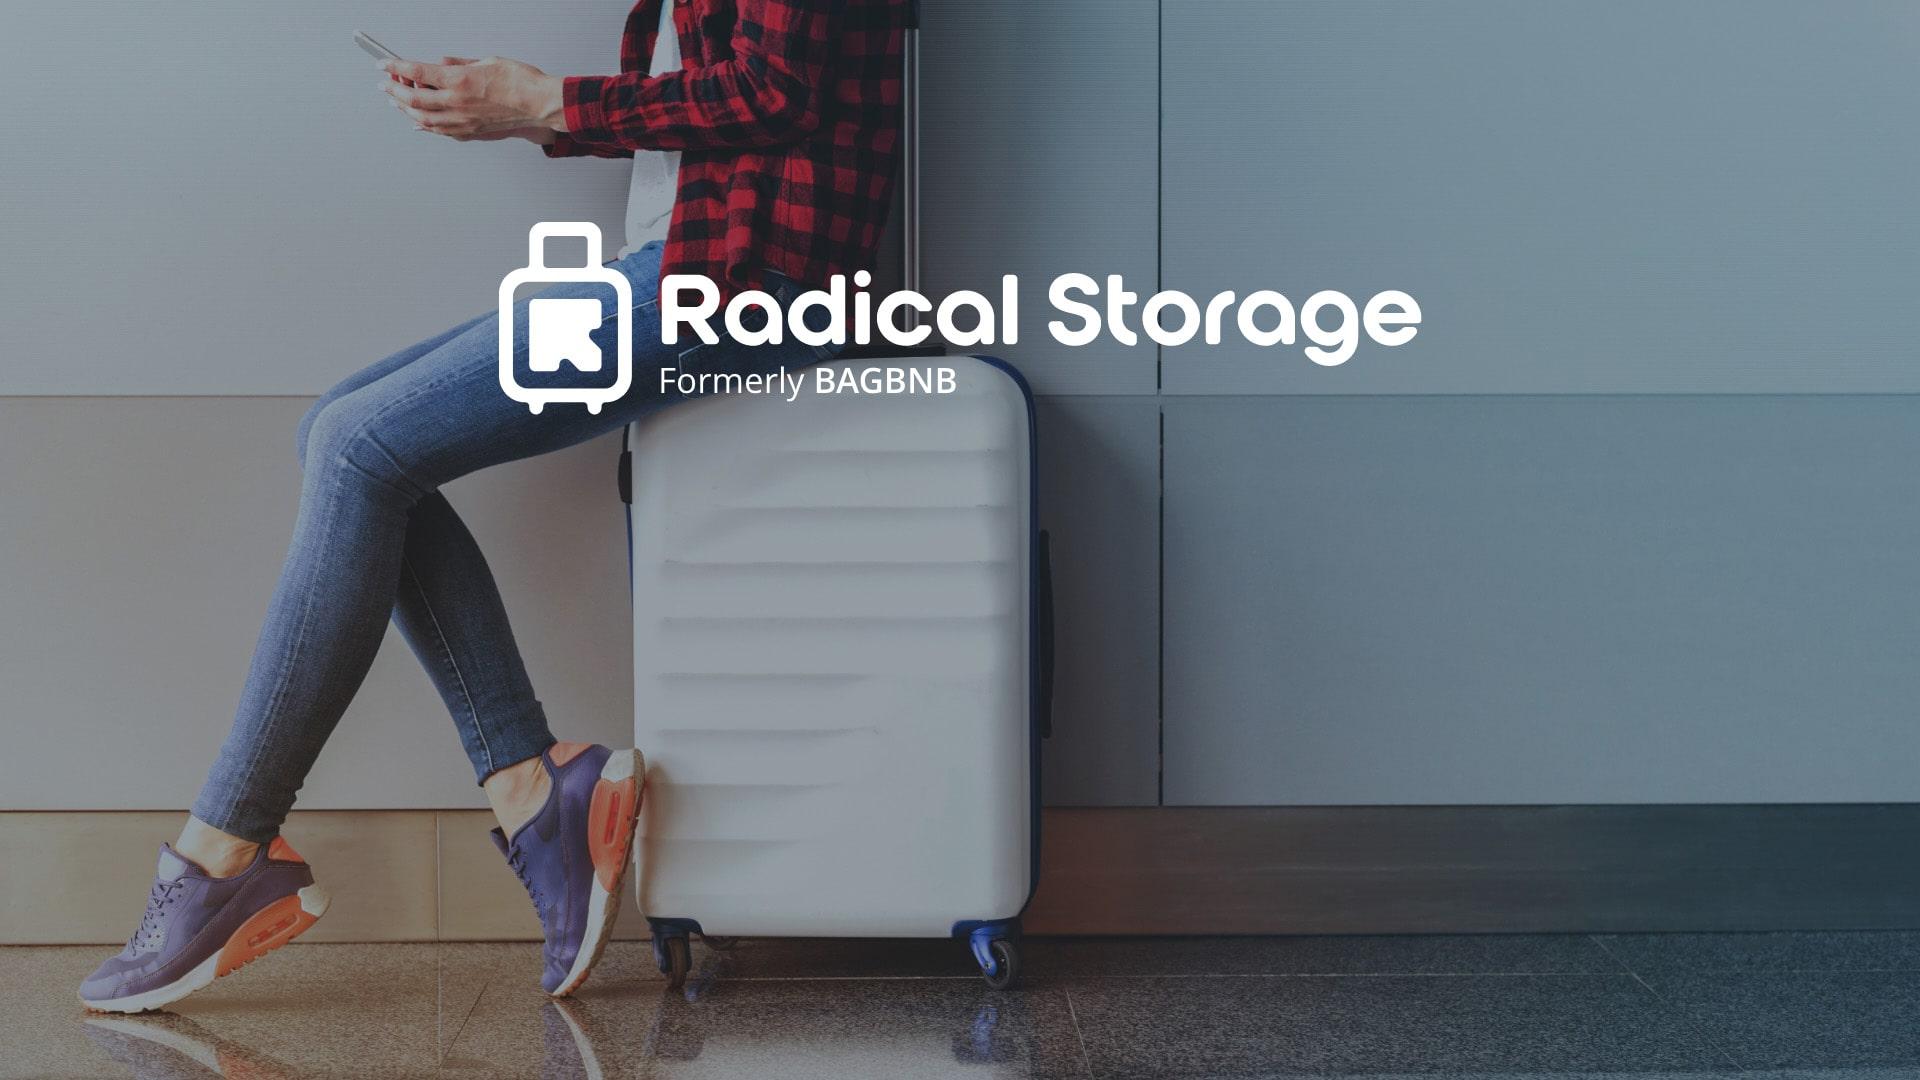 Radical Storage about us